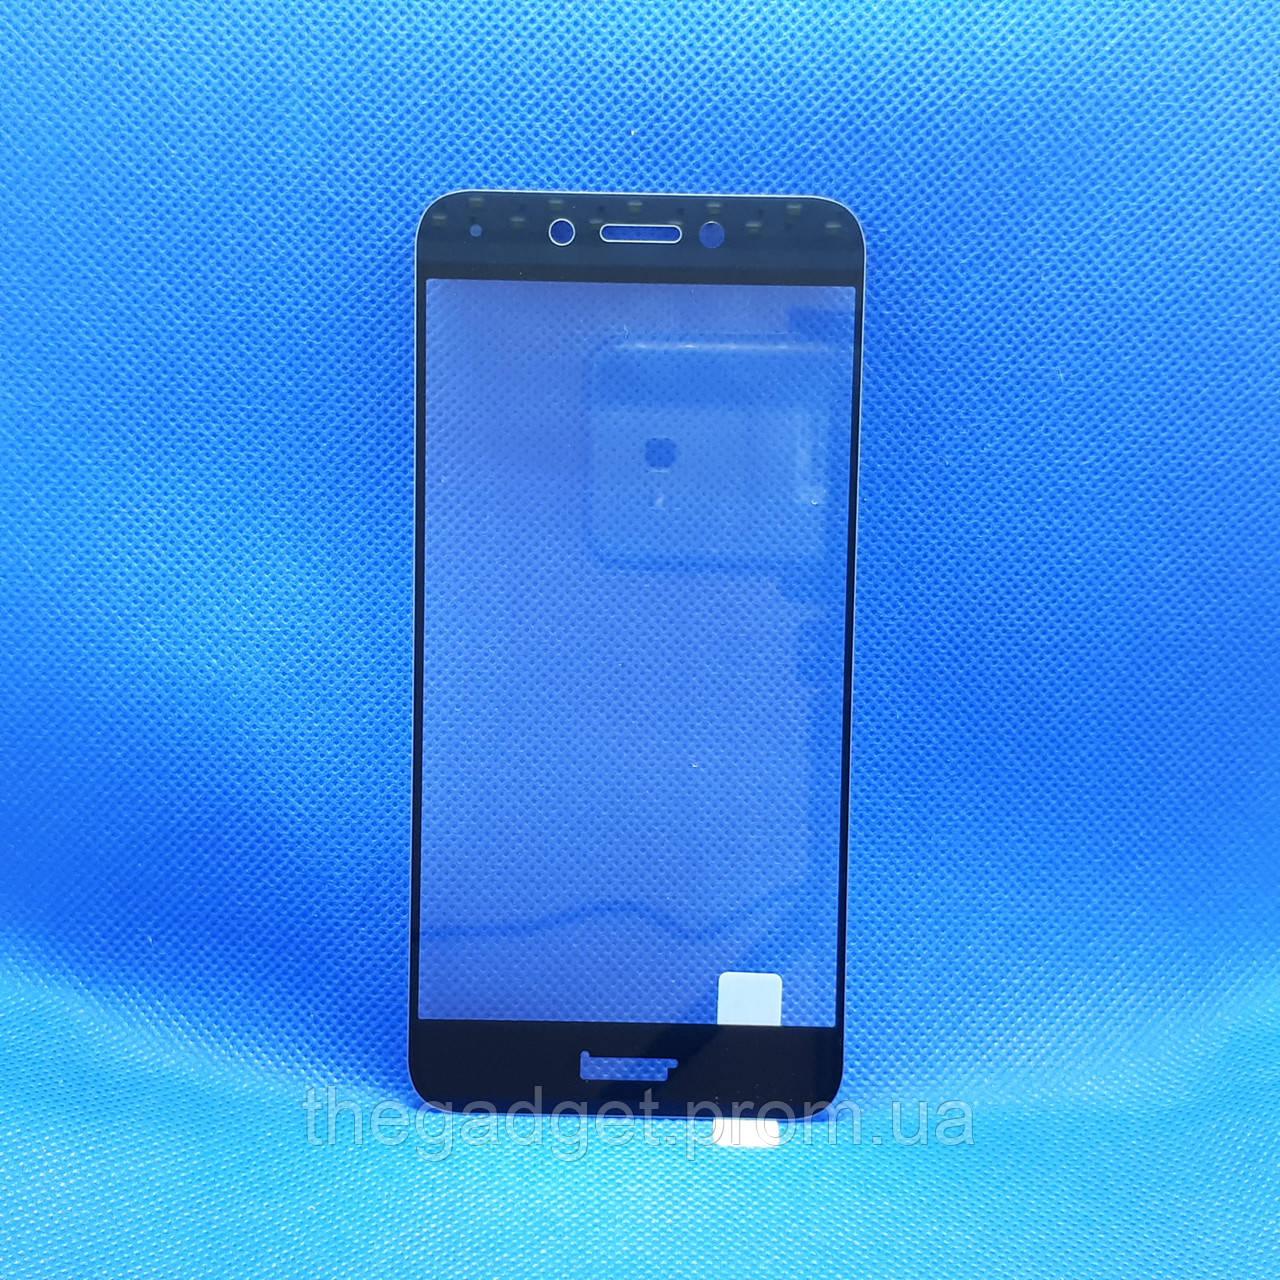 Защитное стекло для Huawei Honor 6a (DLI-TL20) Черное на весь экран